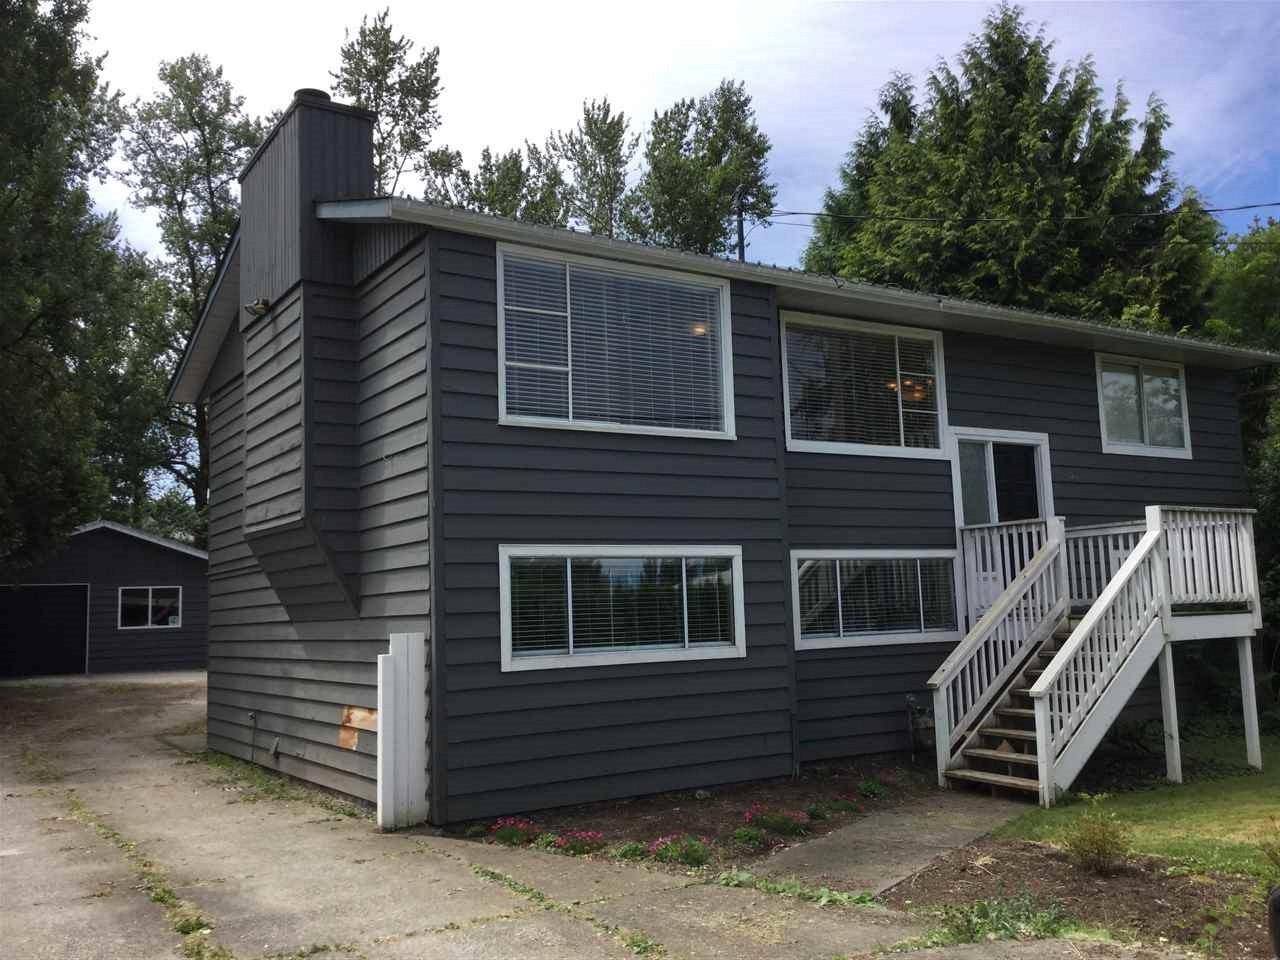 Detached at 18470 74 AVENUE, Cloverdale, British Columbia. Image 1